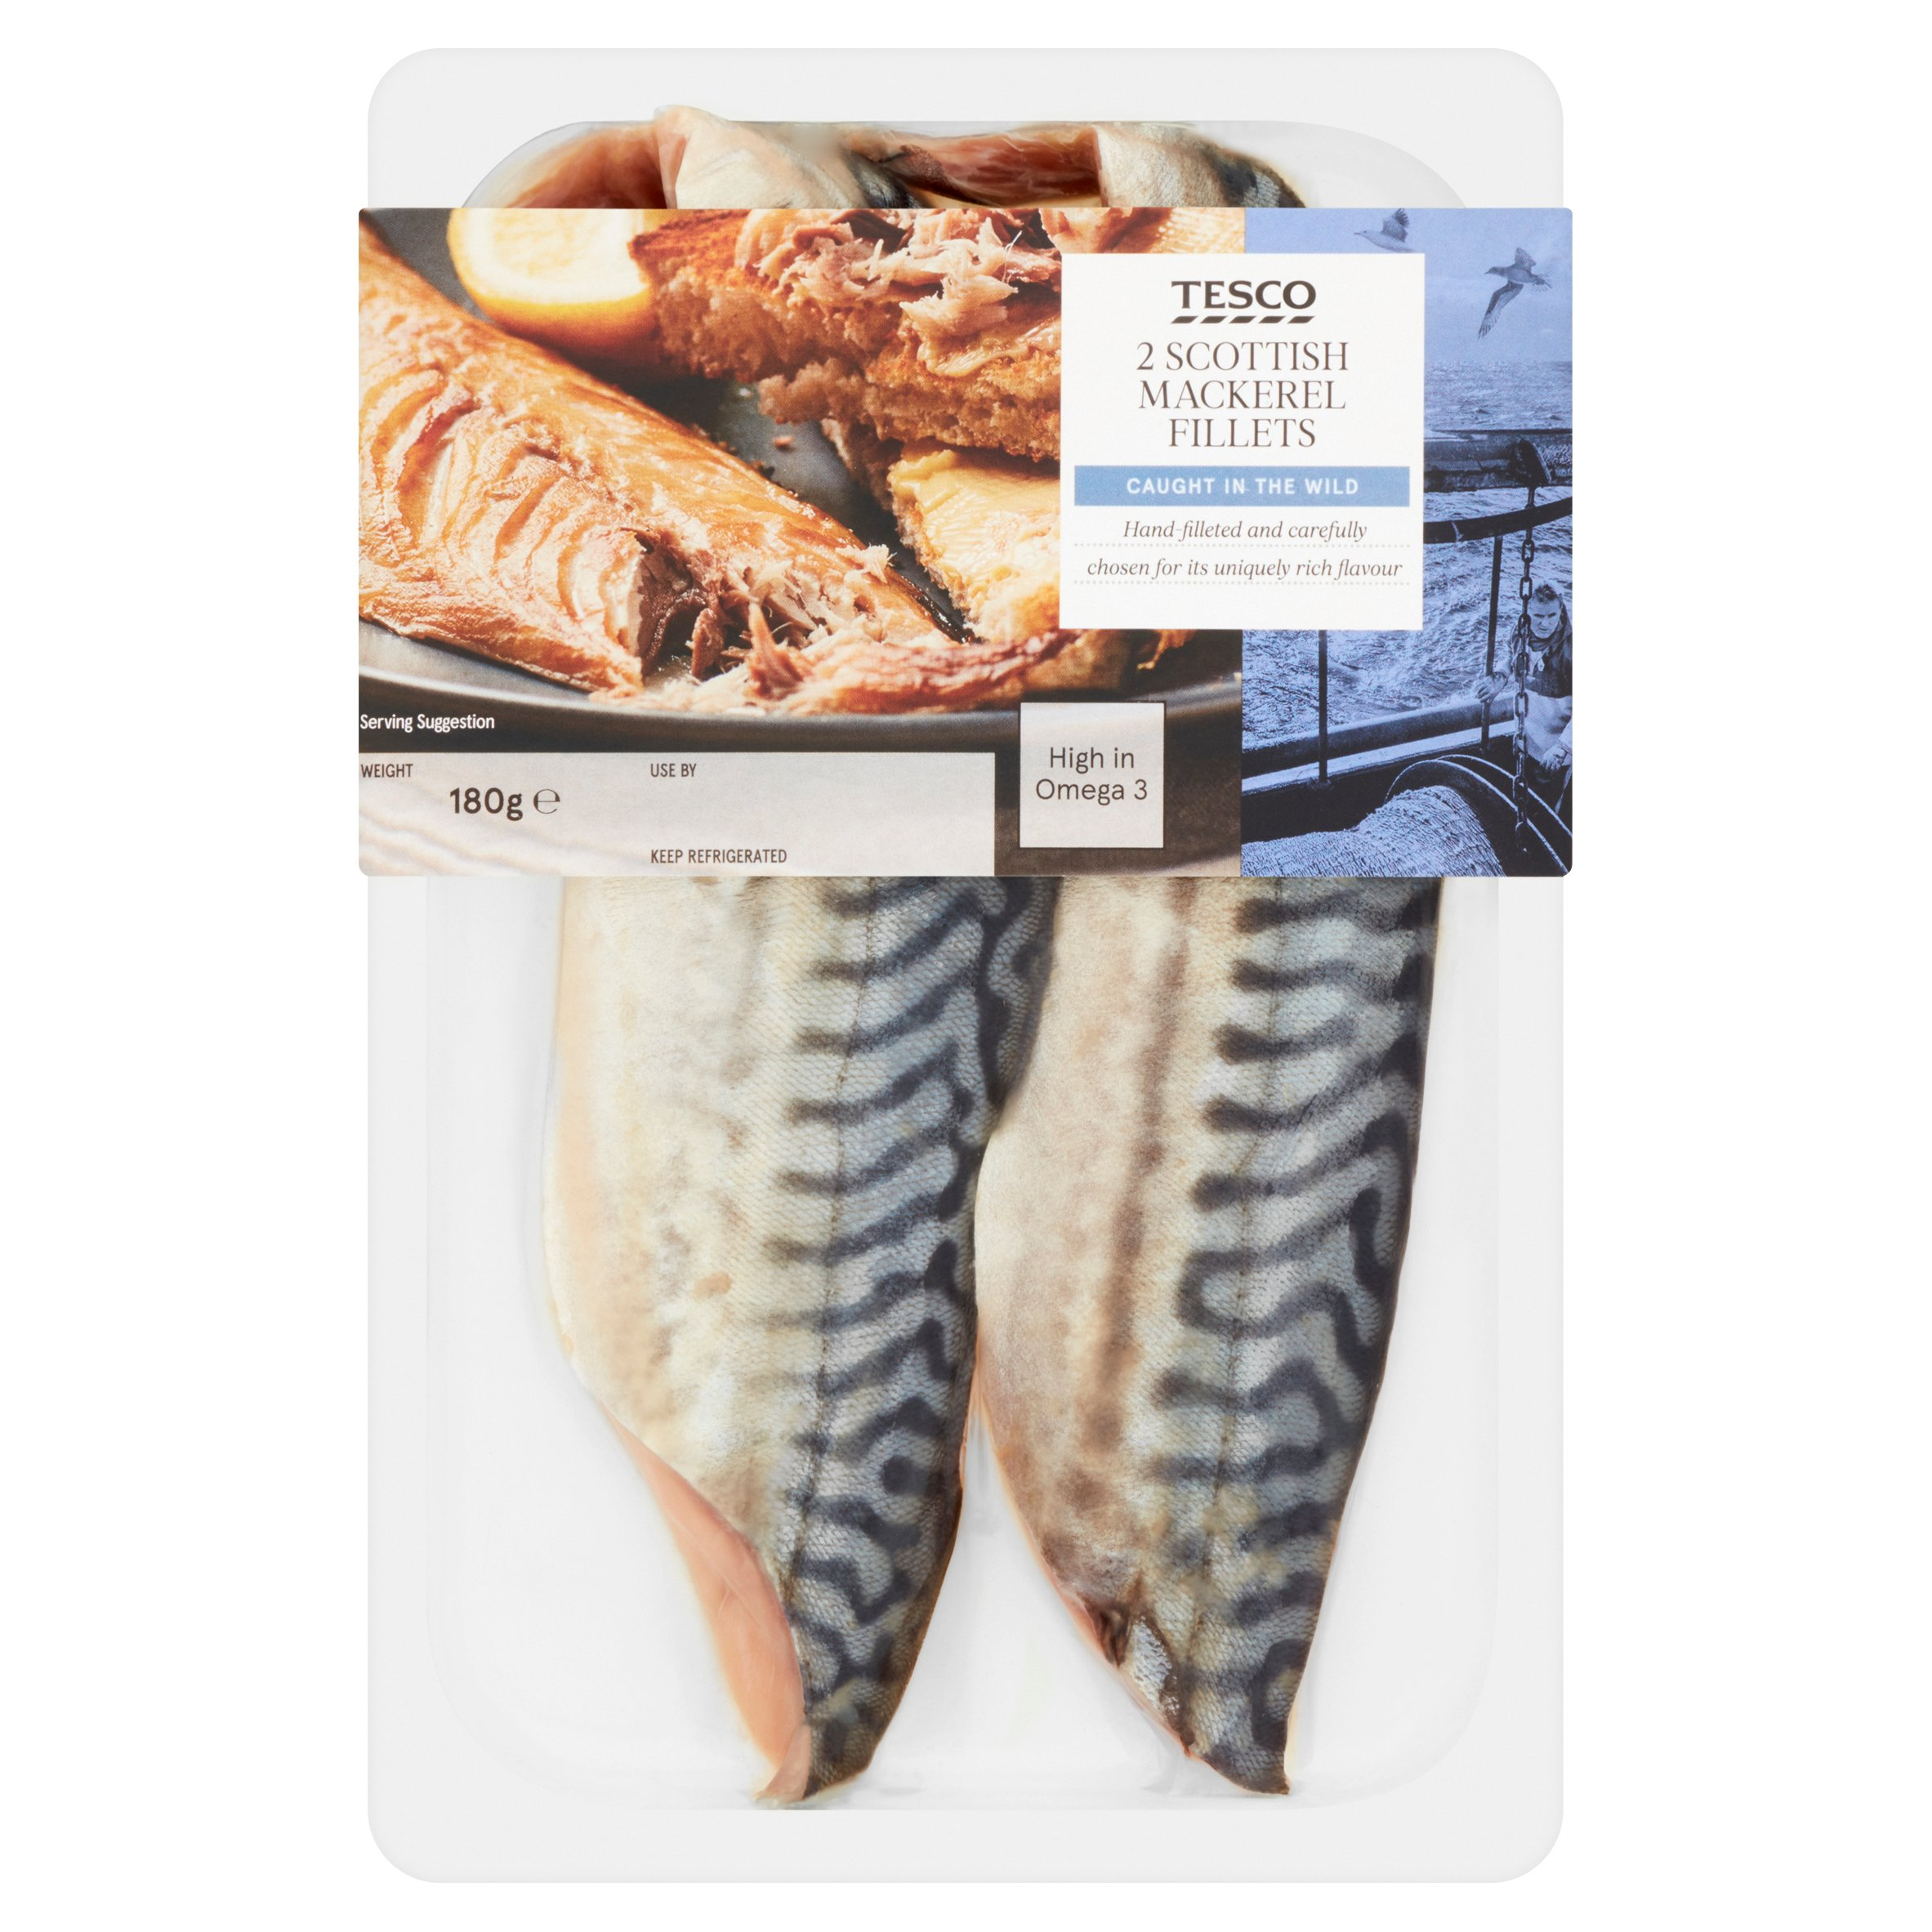 Tesco Scottish Mackerel Fillets 180G